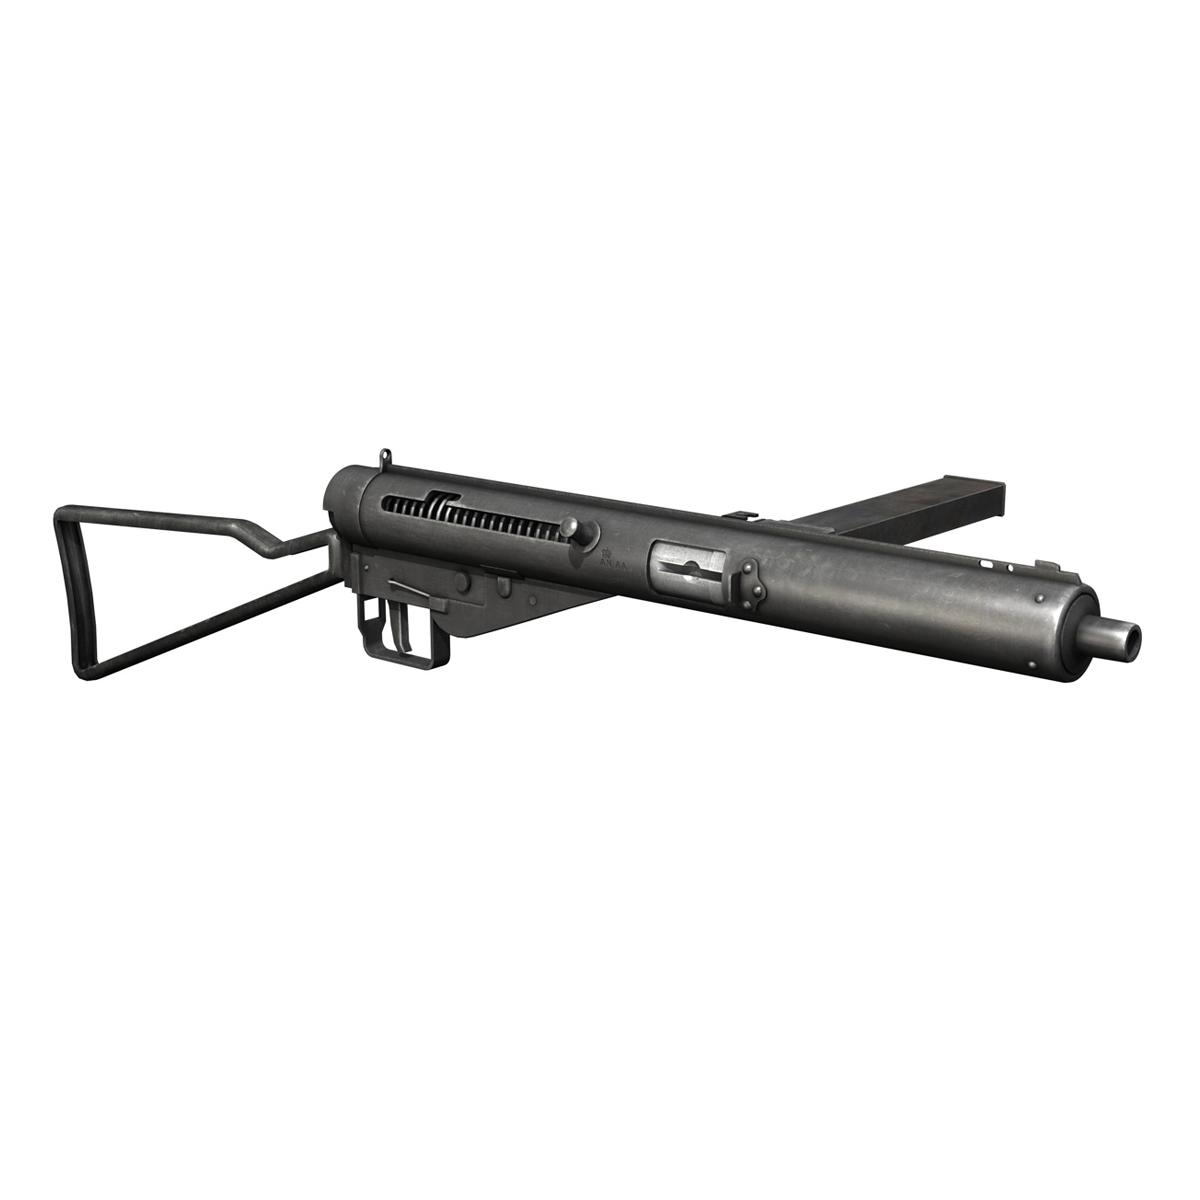 sten mk.iii submachine gun 3d model 3ds fbx c4d lwo obj 195116